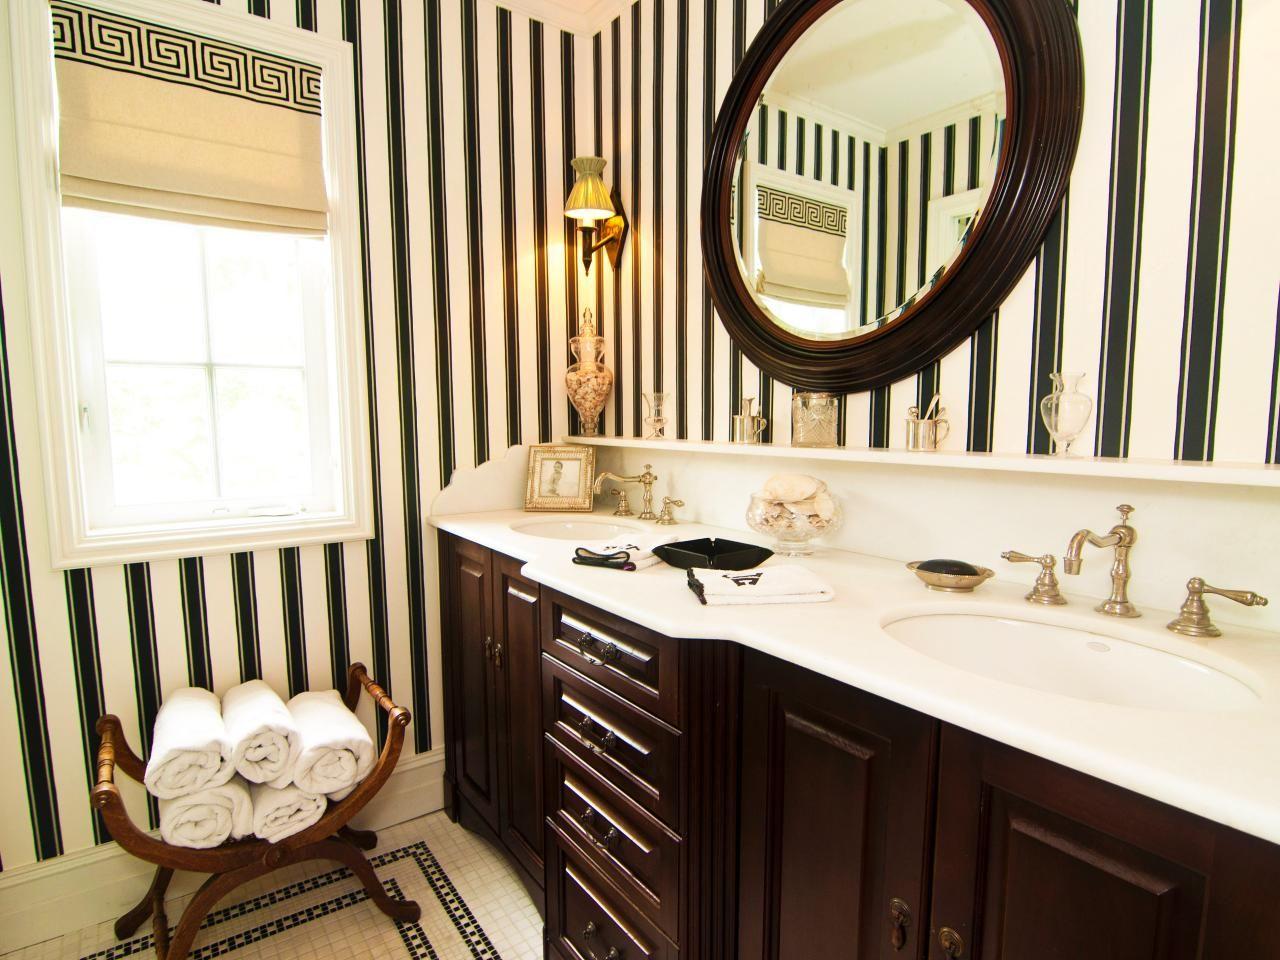 Tuscan Bathroom Design Ideas: HGTV Pictures & Tips | Marble ... on farmhouse bathroom walls, composite bathroom walls, faux finish bathroom walls, victorian bathroom walls, rustic bathroom walls,